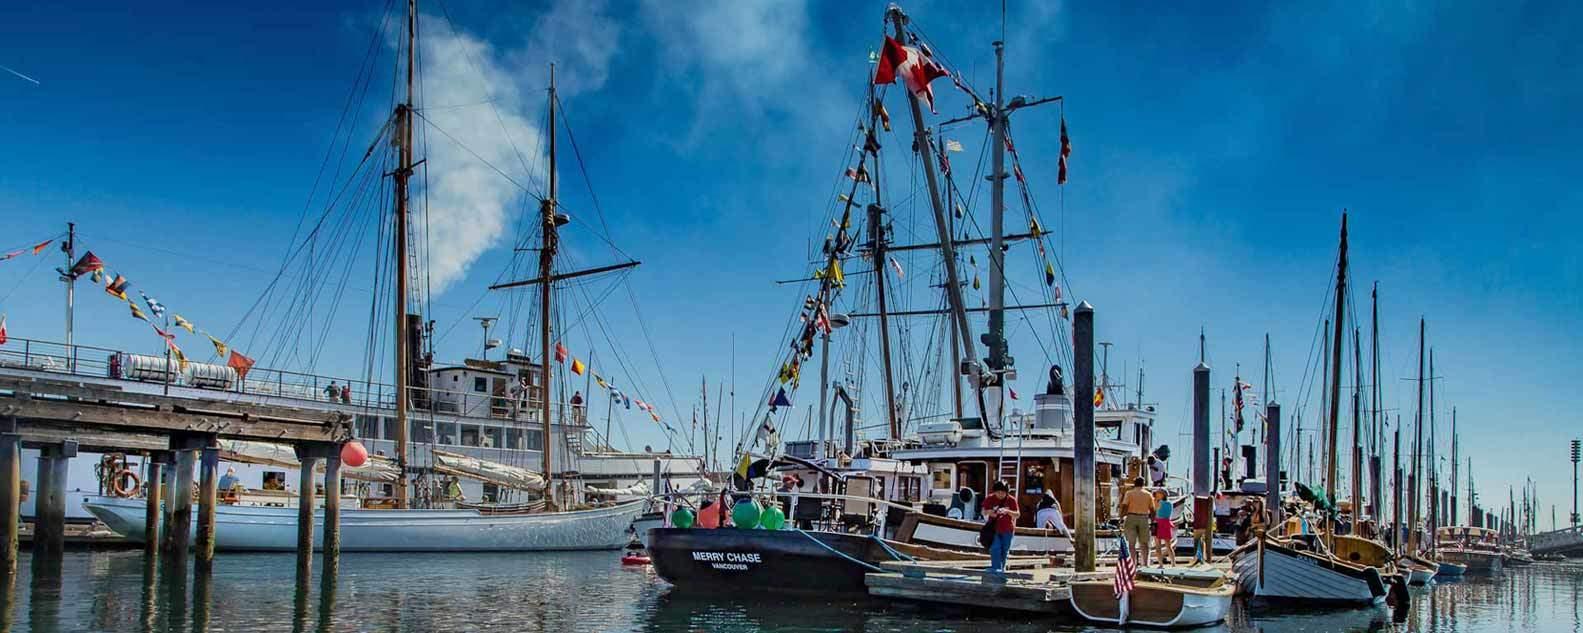 2018 Wooden Boat Festival Sept 7 9 Enjoy Port Townsend